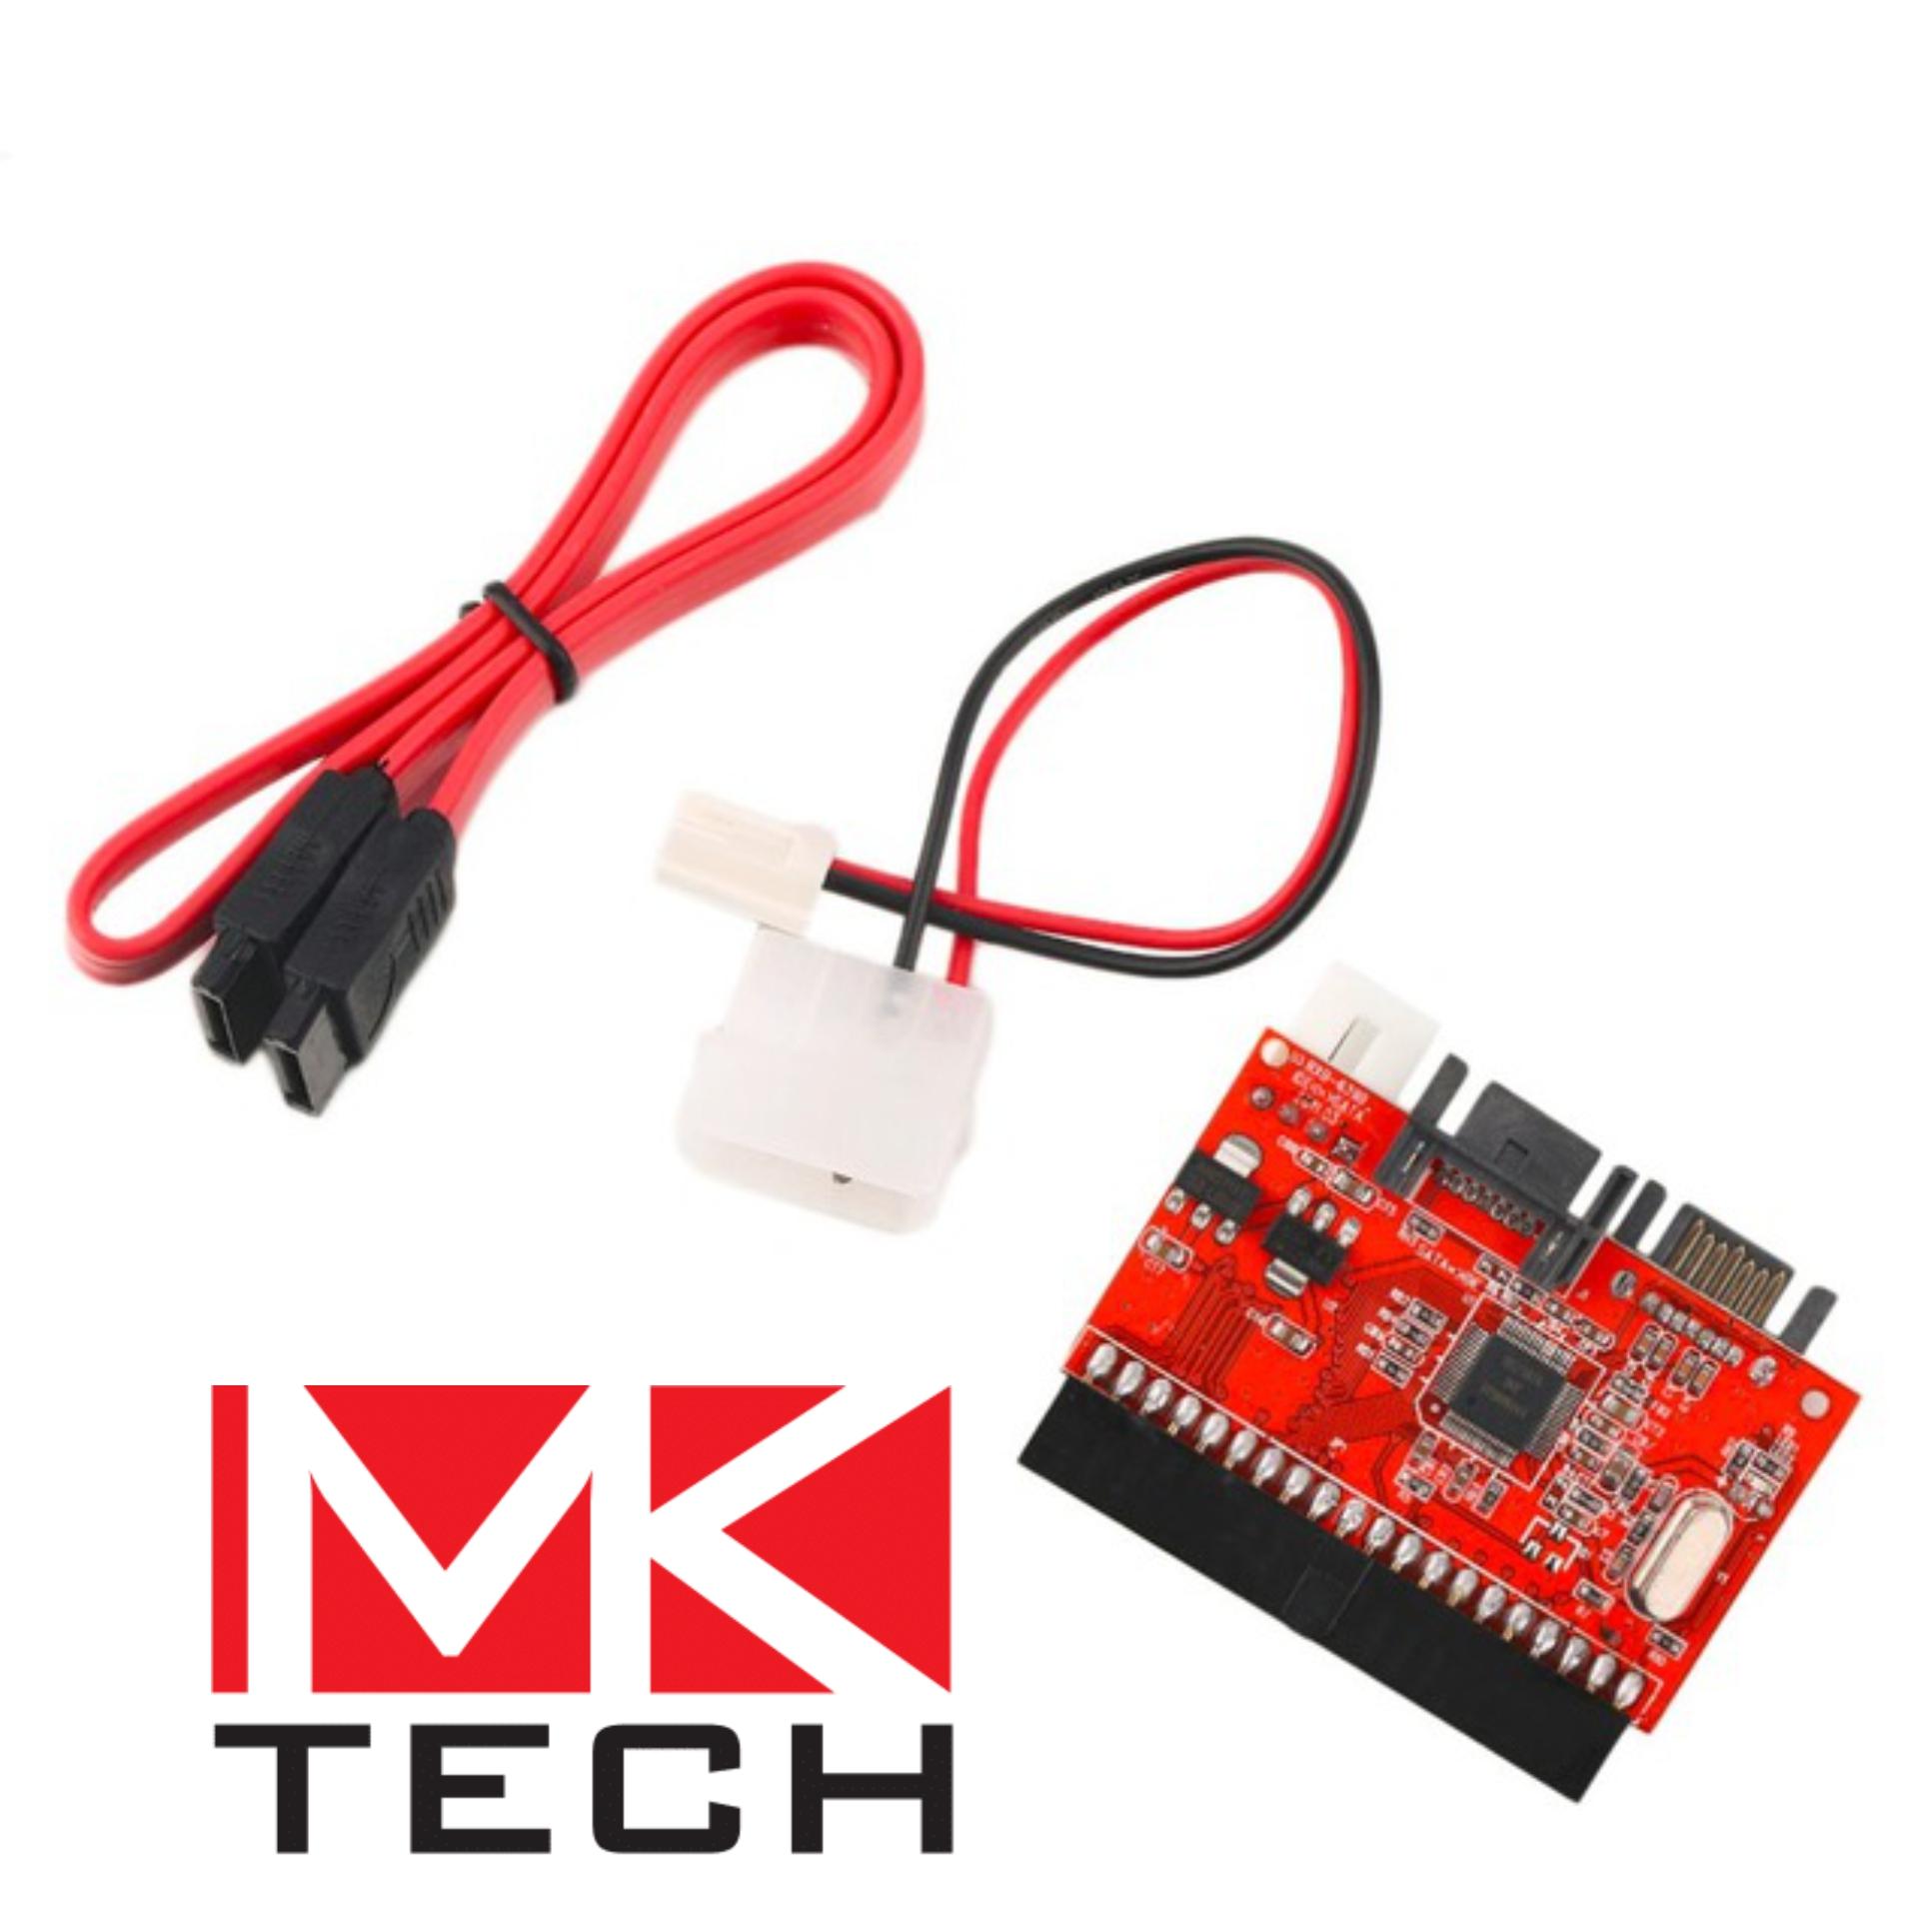 MKTECH IDE/Sata Converter for SATA/ATA HDD